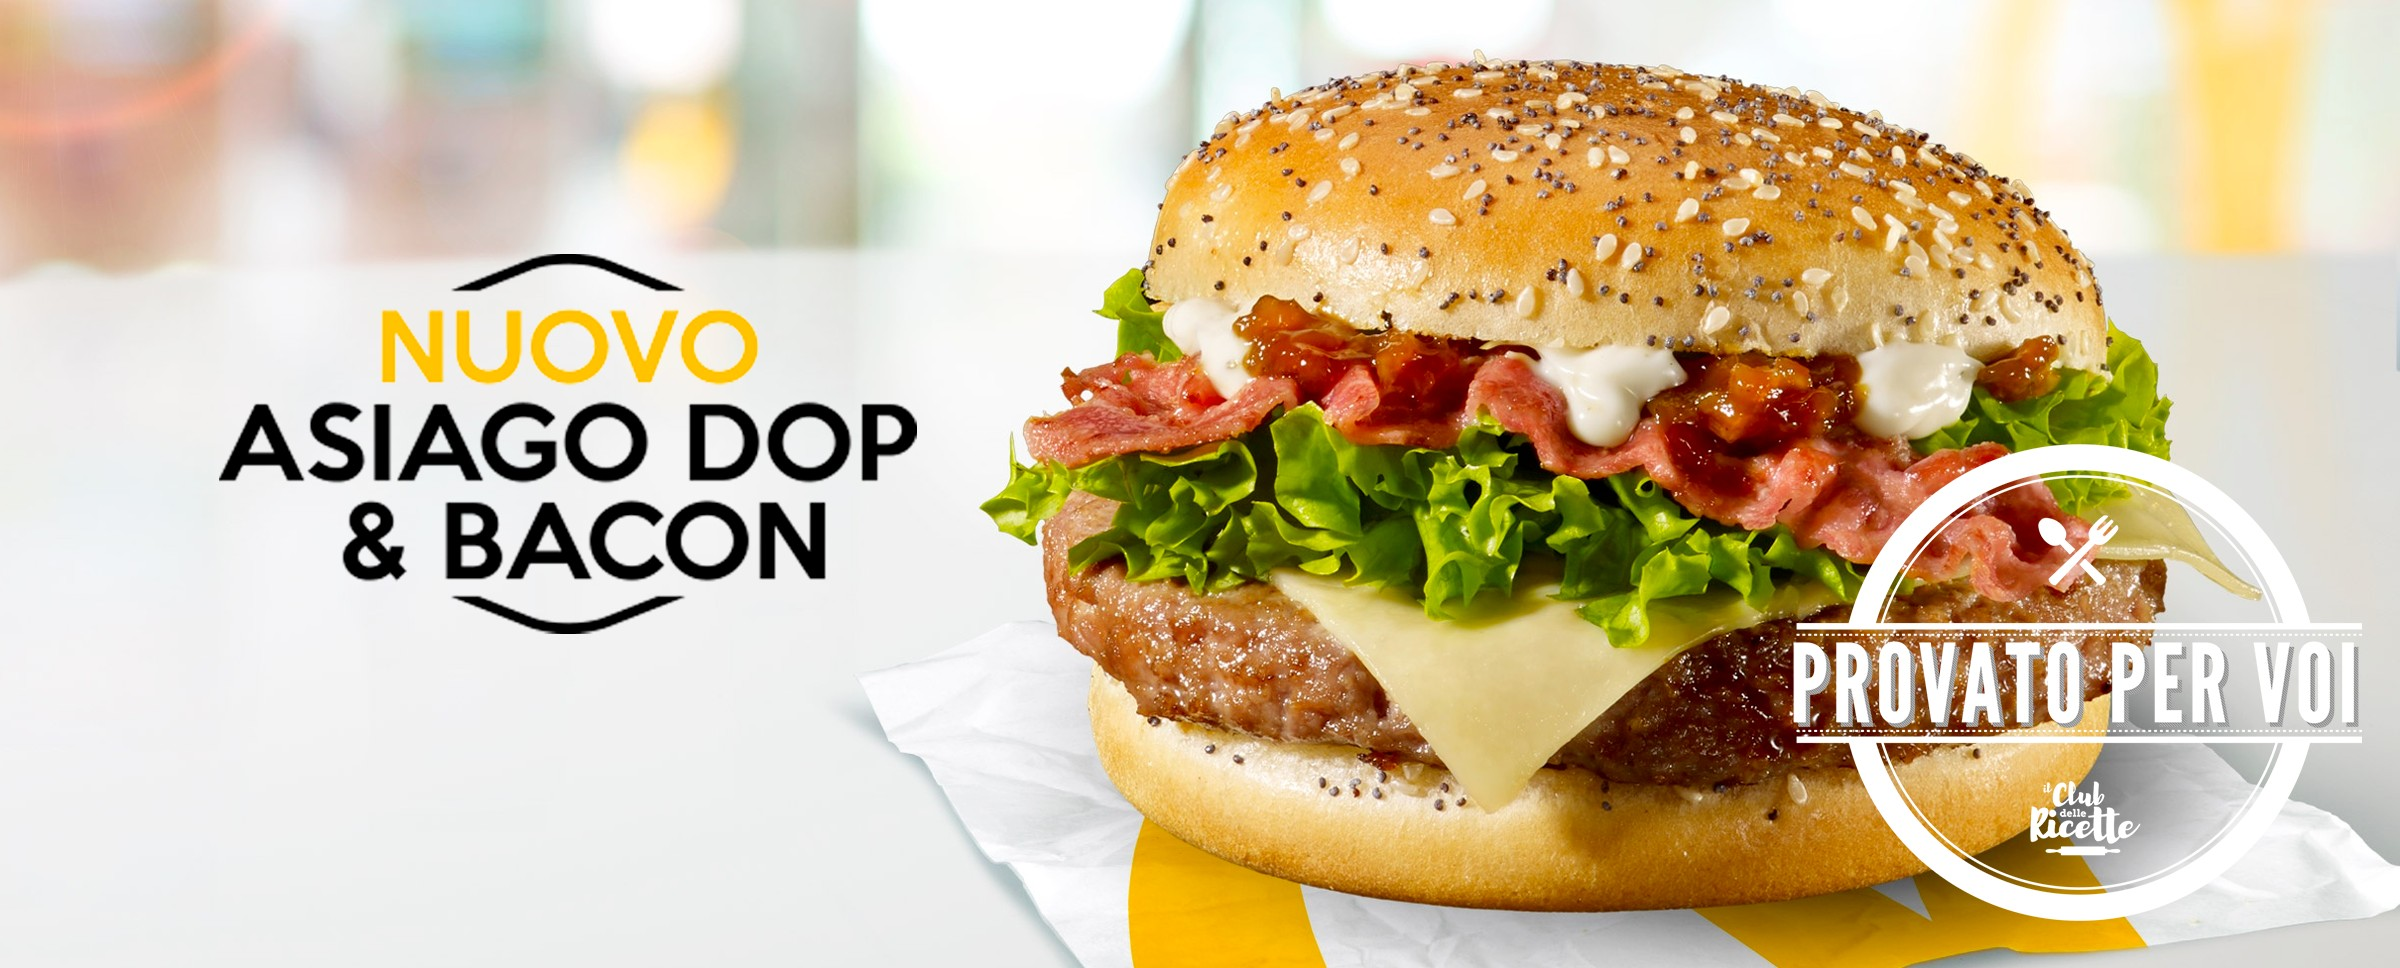 Mcdonald Myselection Asiago Dop Bacon